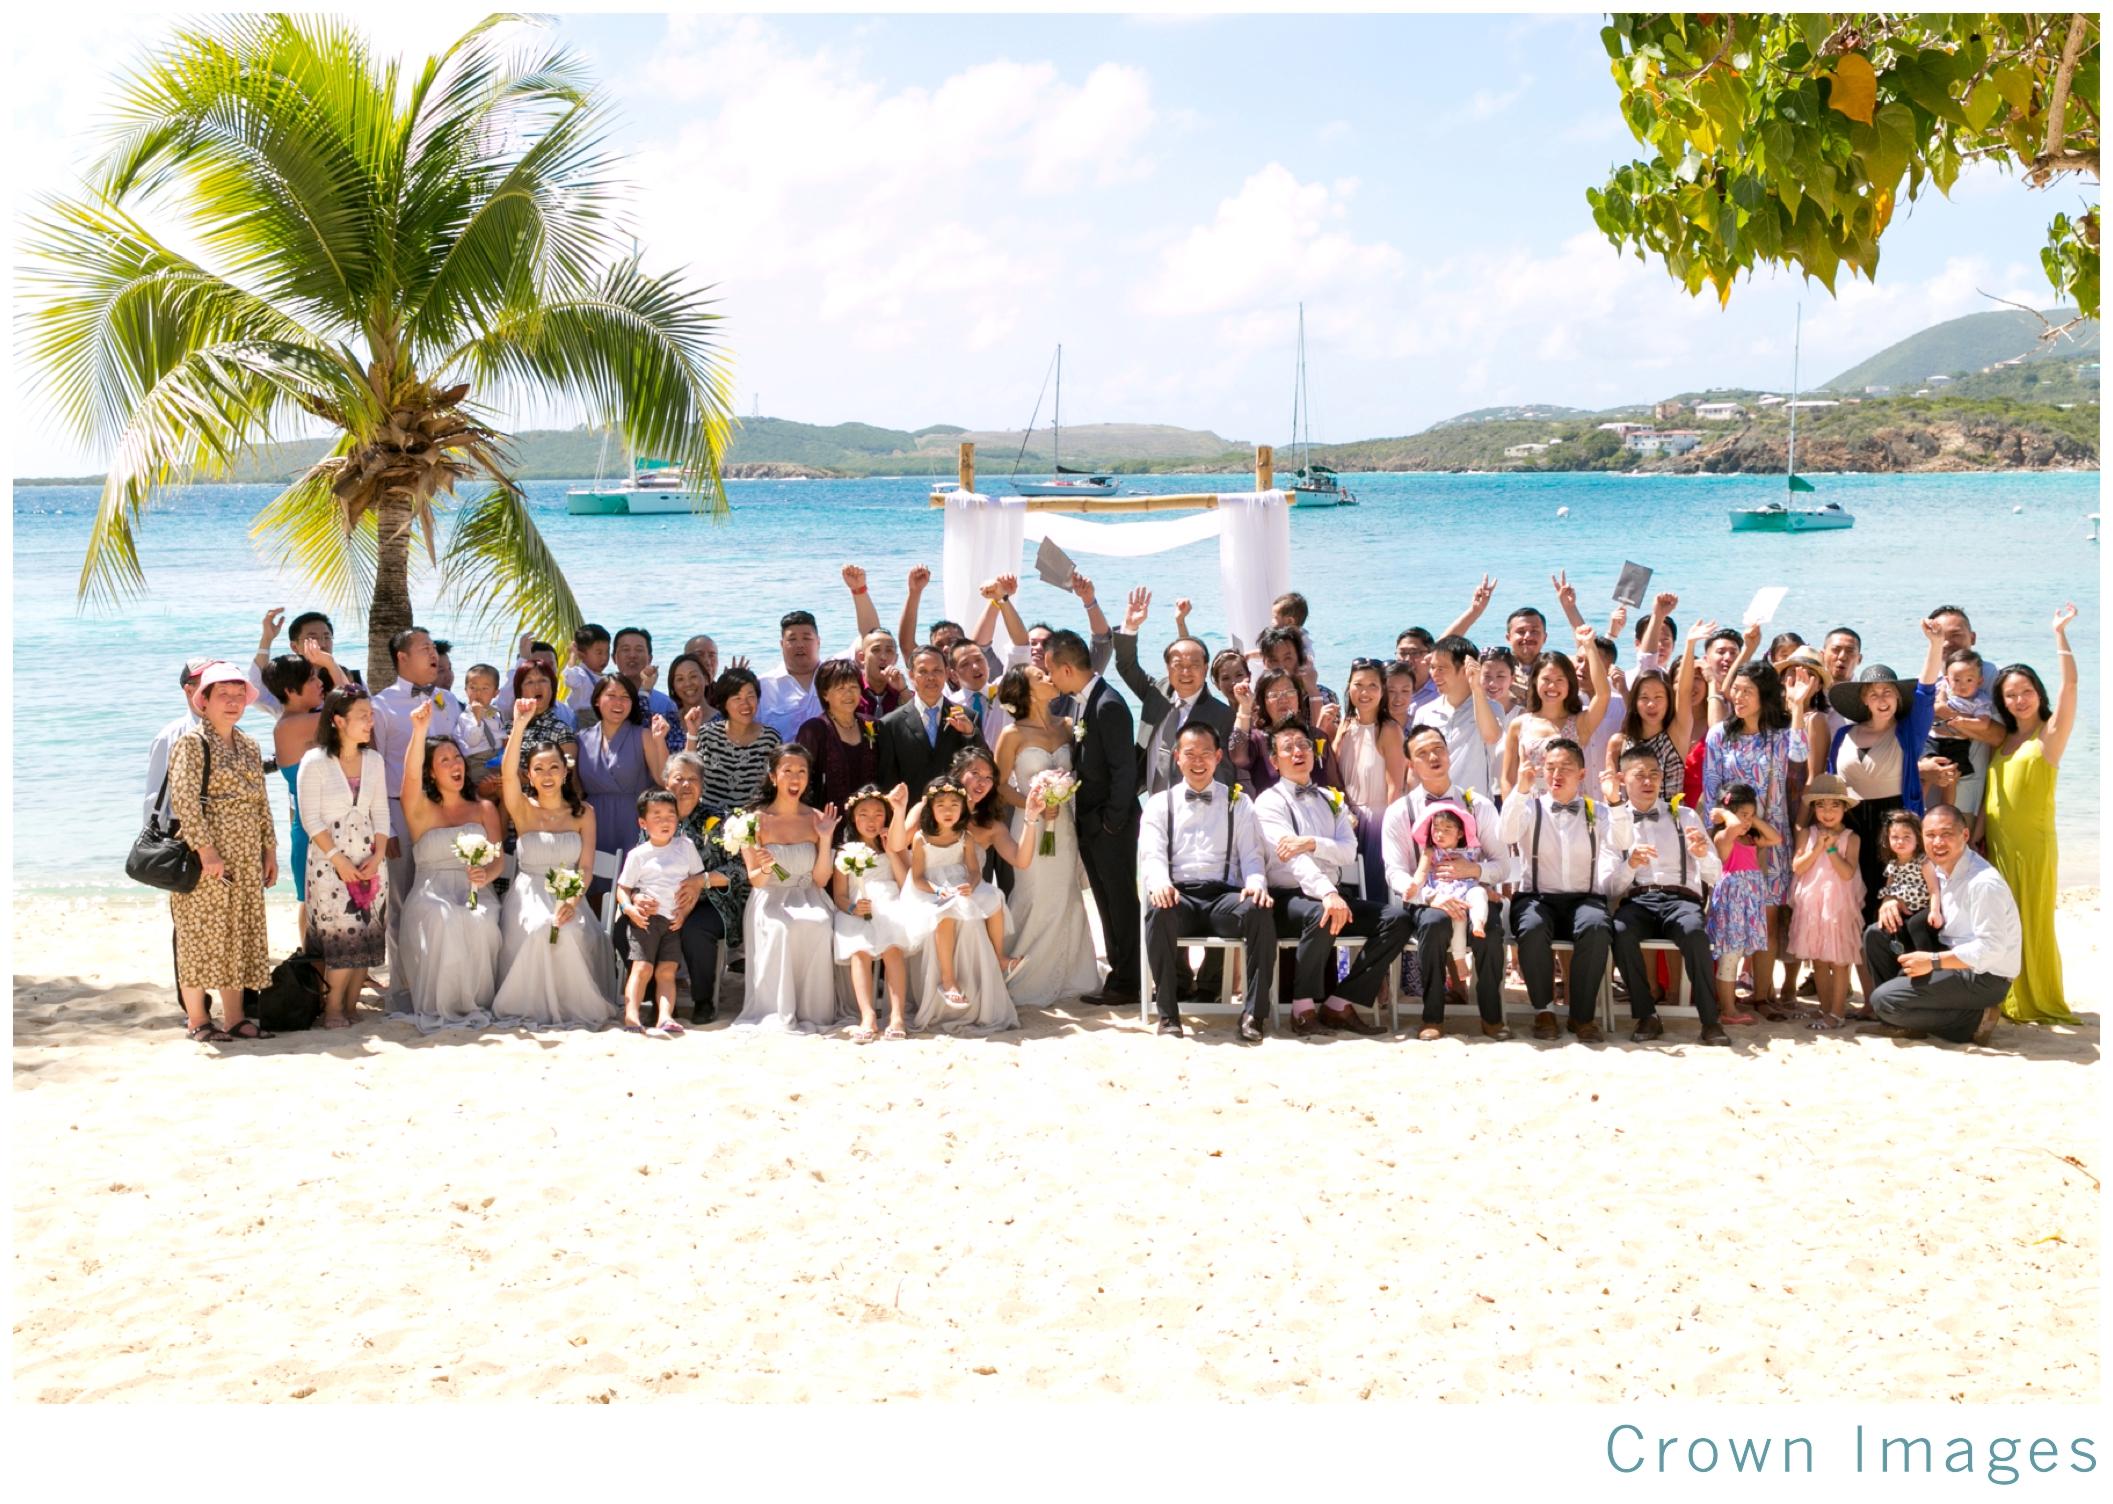 st_thomas_wedding_photographer_0800.jpg